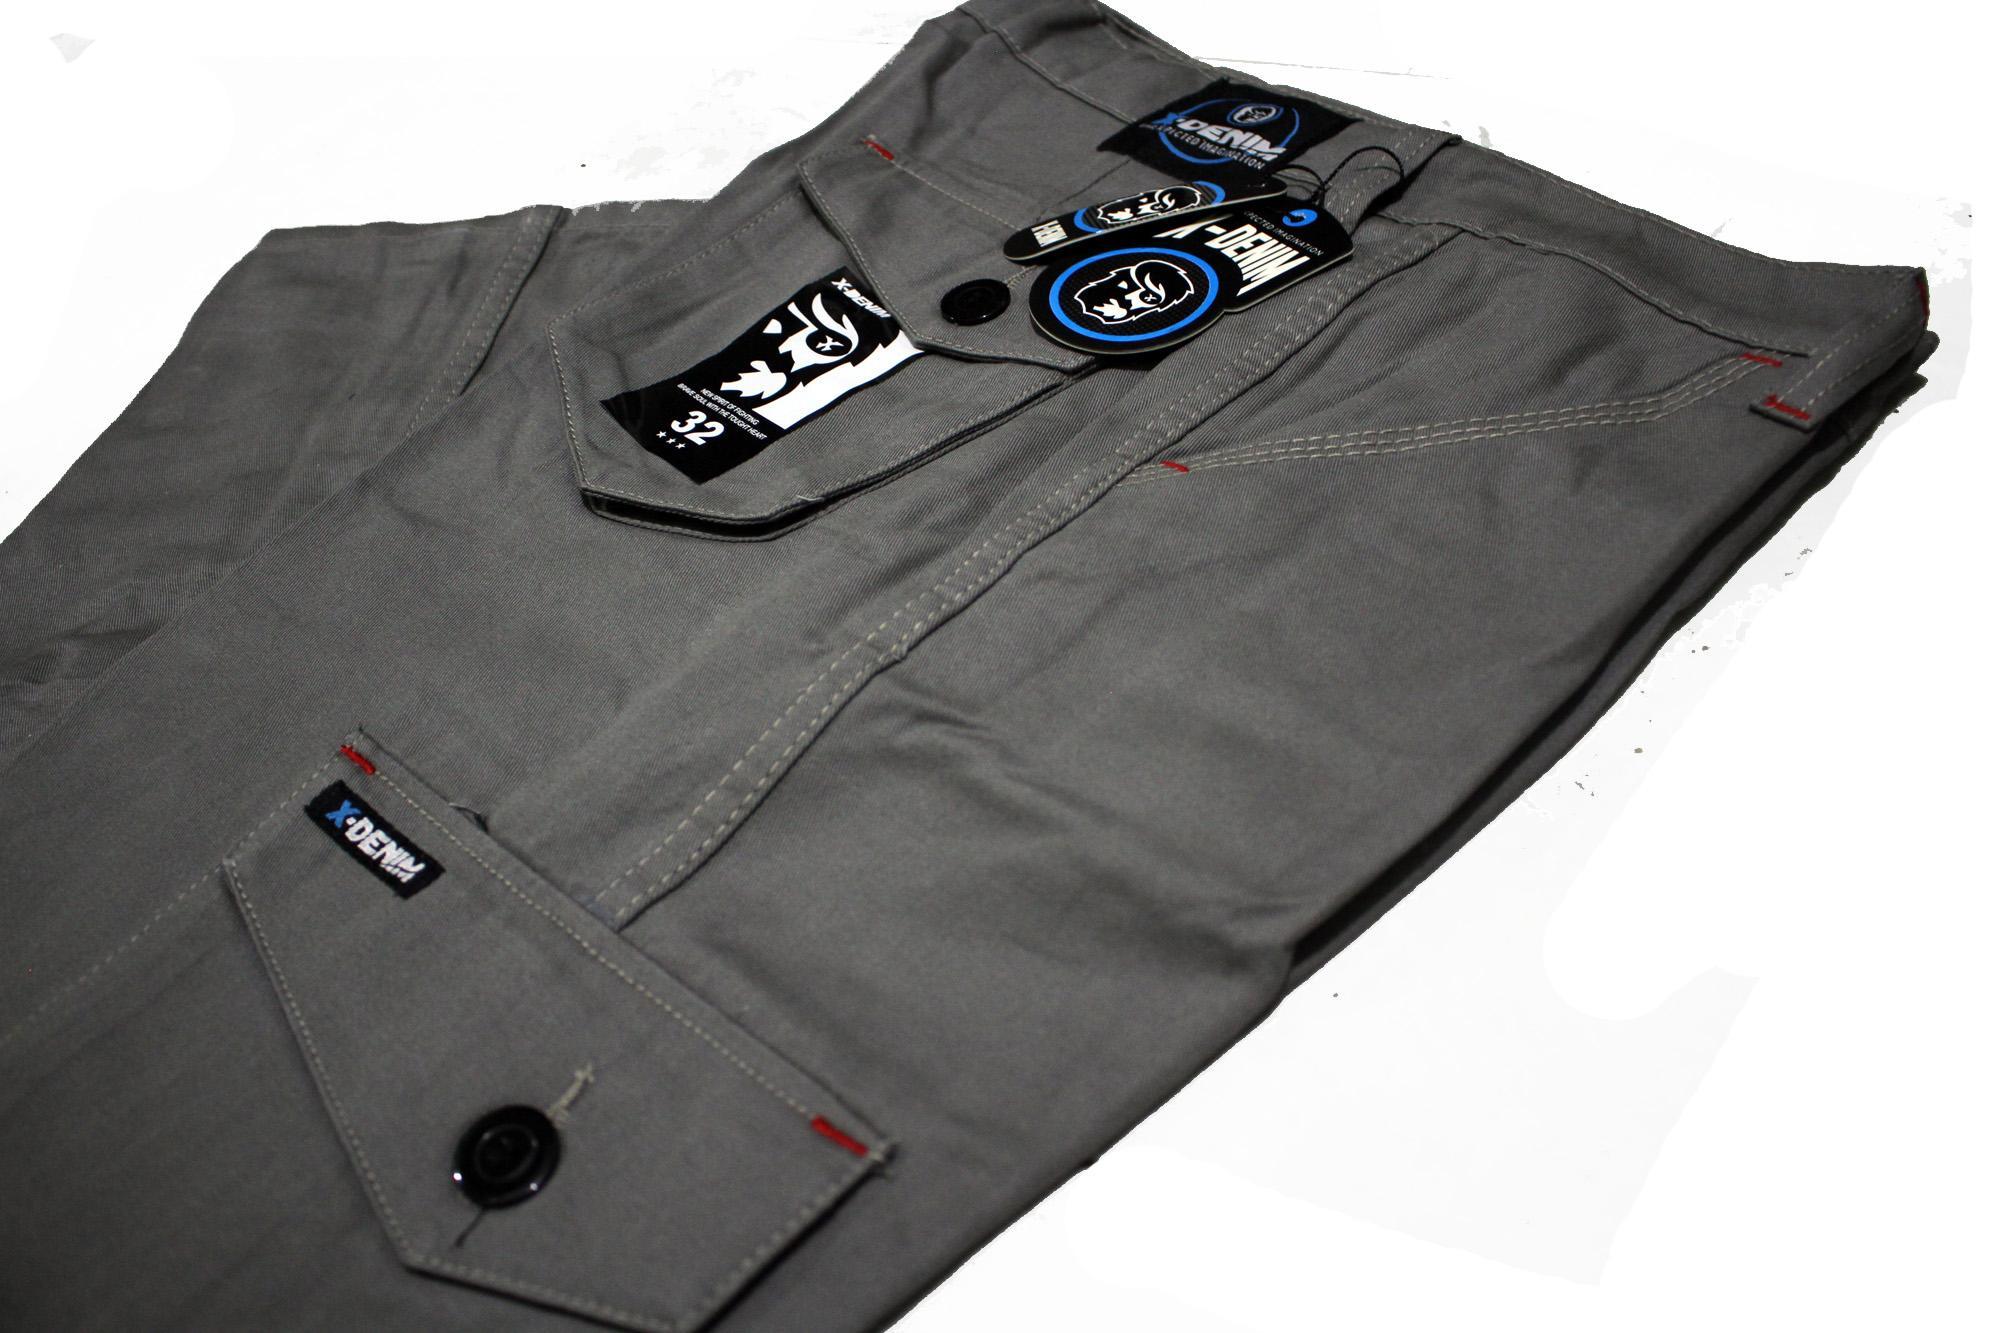 Celana Cargo Pendek Army Dark Grey Daftar Harga Terkini Aglint Coklat Kargo Merk Walcott Motif Sleman Kab Fashion Source